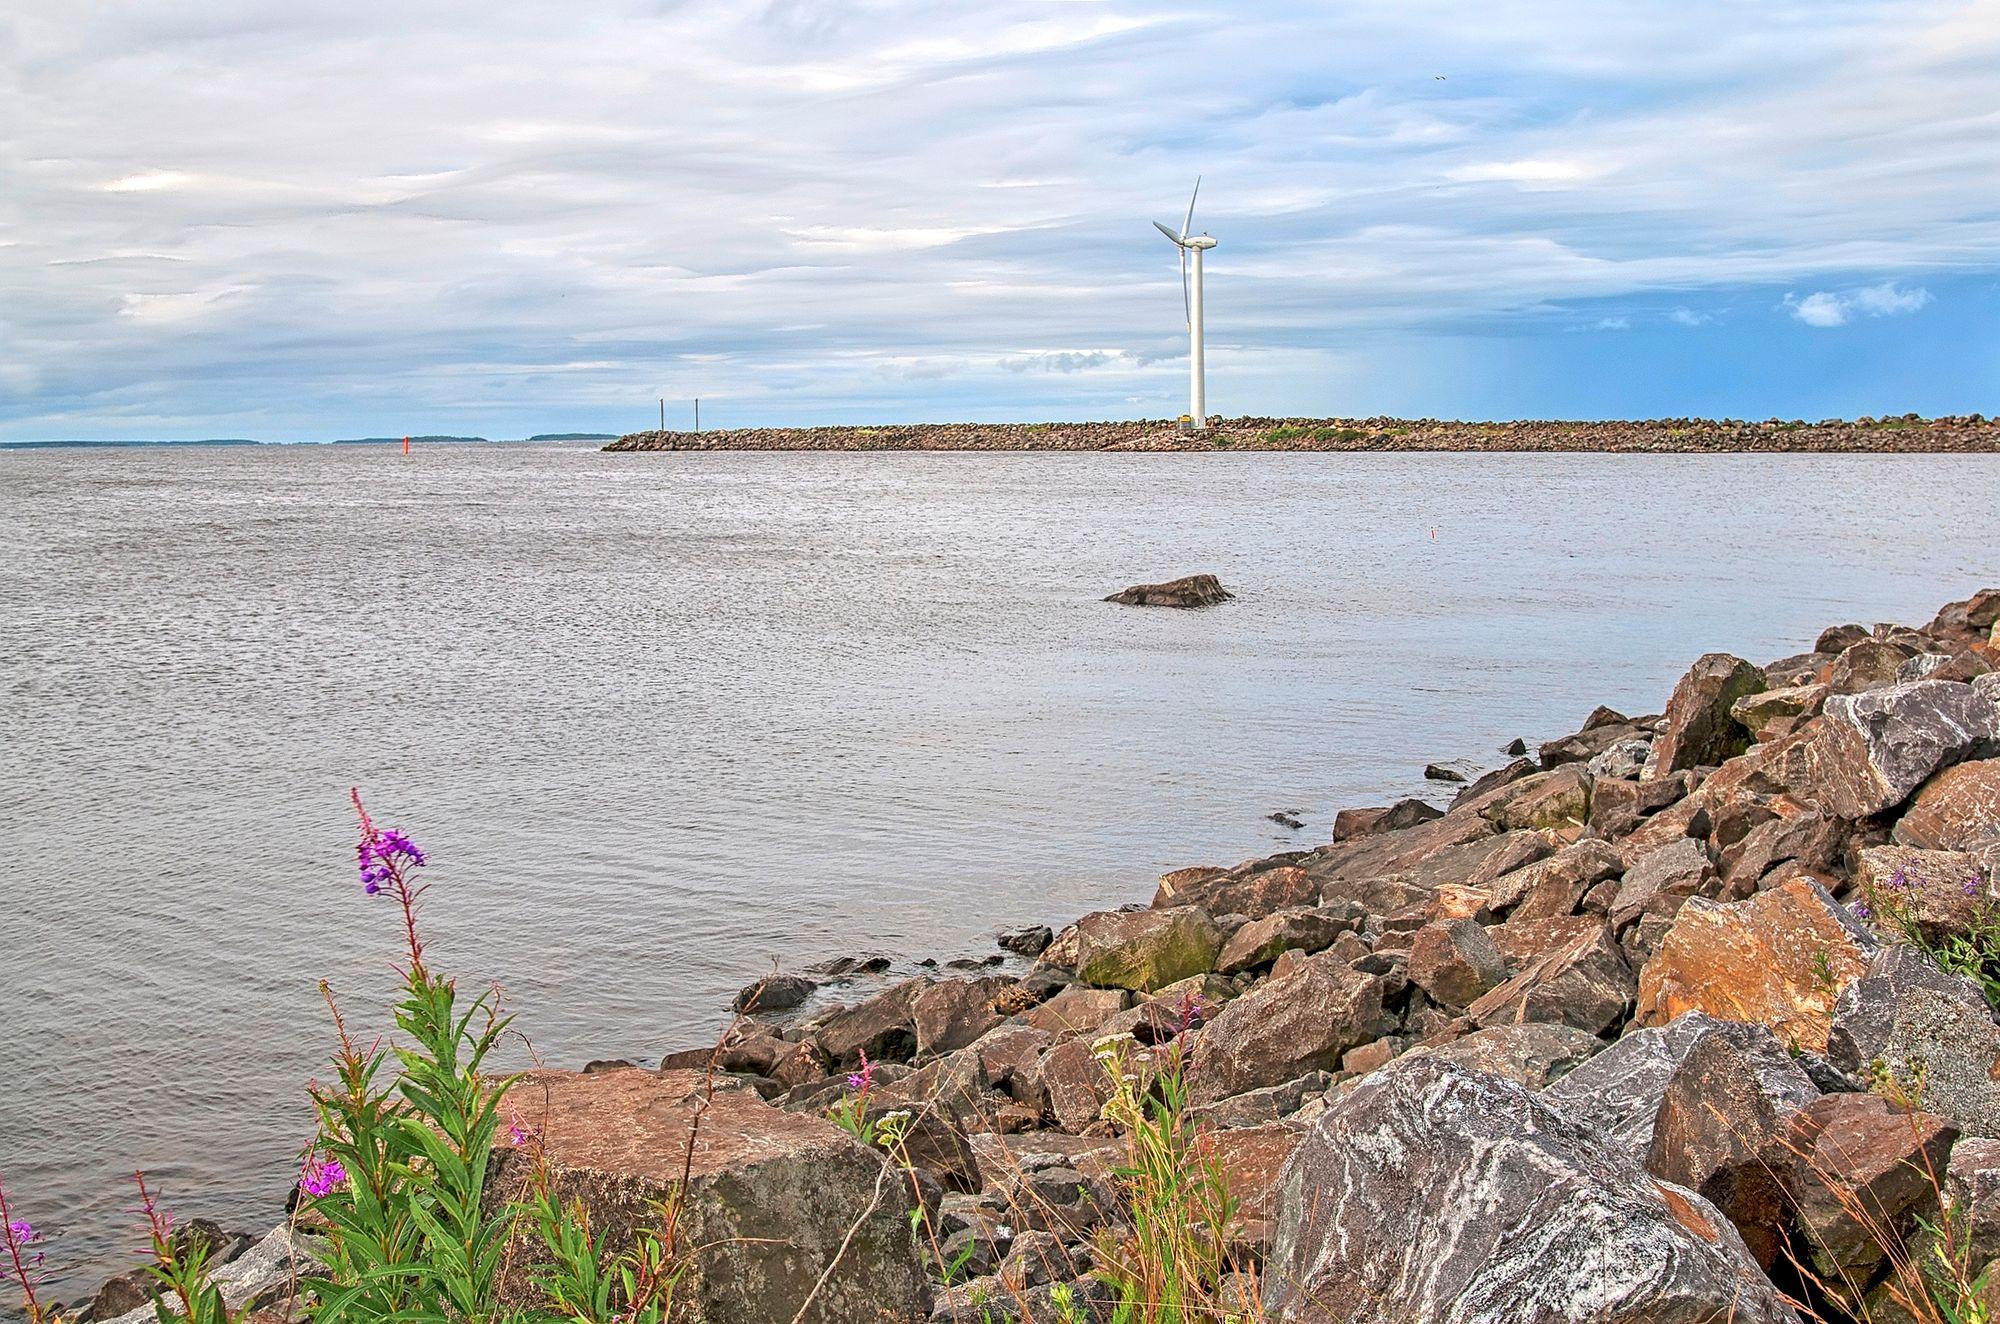 Reposaari. Finland. Windmill on the shore of The Gulf of Bothnia © Ojimorena